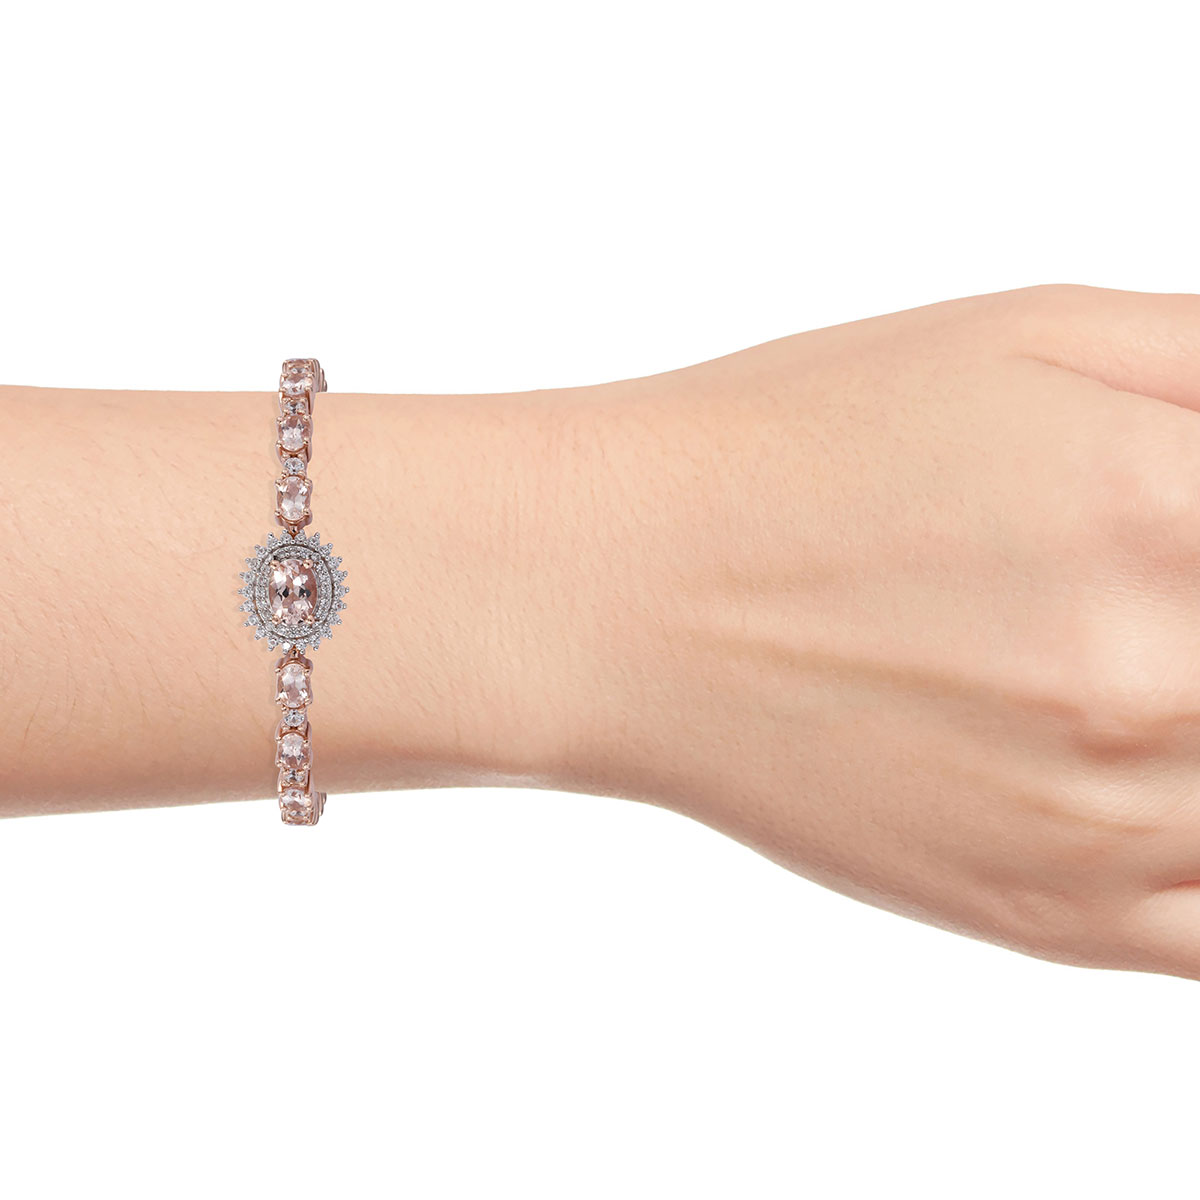 AA Premium Marropino Morganite, Zircon Bolo Bracelet in Vermeil RG Sterling Silver (9.50 In) 6.48 ctw